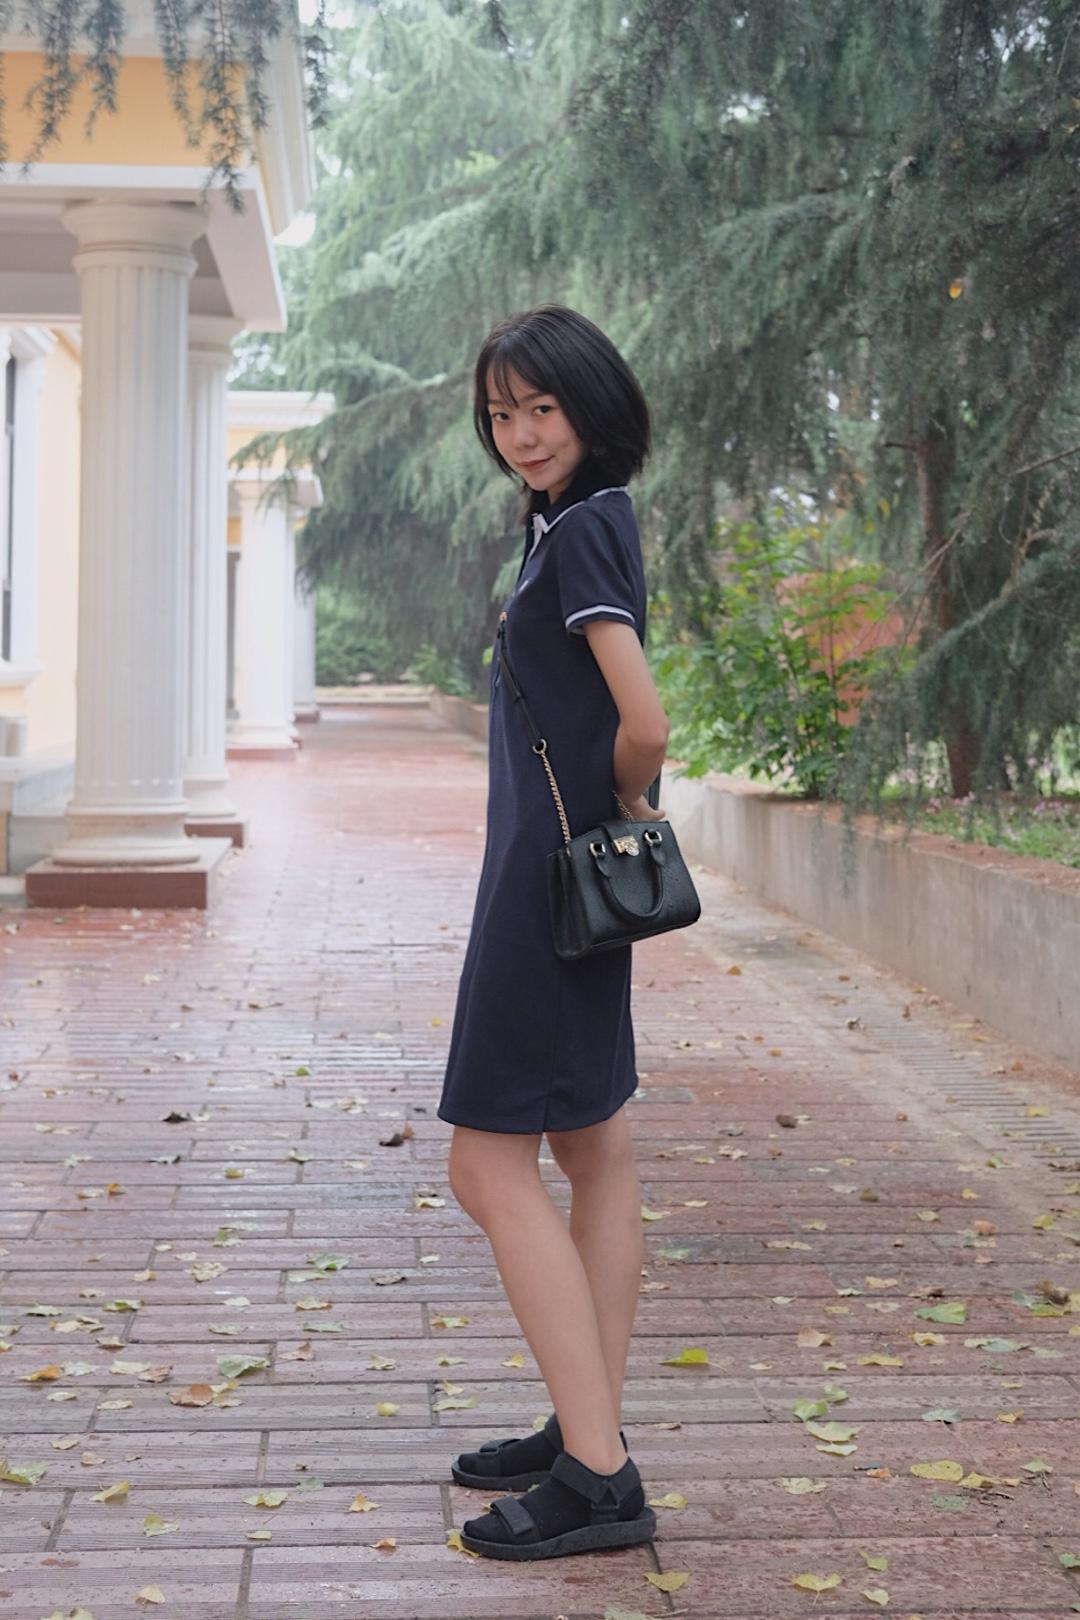 ZhOOTD | 雨天等你下课☔ 💦夏季不仅是很晒还经常天气多变!所以晴雨伞就特别重要辽,万一老天一转眼就下起了雨,没有带伞就很惨哎 🚶🏻♀️今天又穿了polo裙,不过深蓝色的颜色更有学院美式休闲风的味道哦 🔍鞋子依然是超舒服的优衣库凉鞋,和黑色的包包颜色比较搭 💗所以,要不要雨天等你一起下课回家呢~ #夏日学会露肤,才能撩倒众生!#